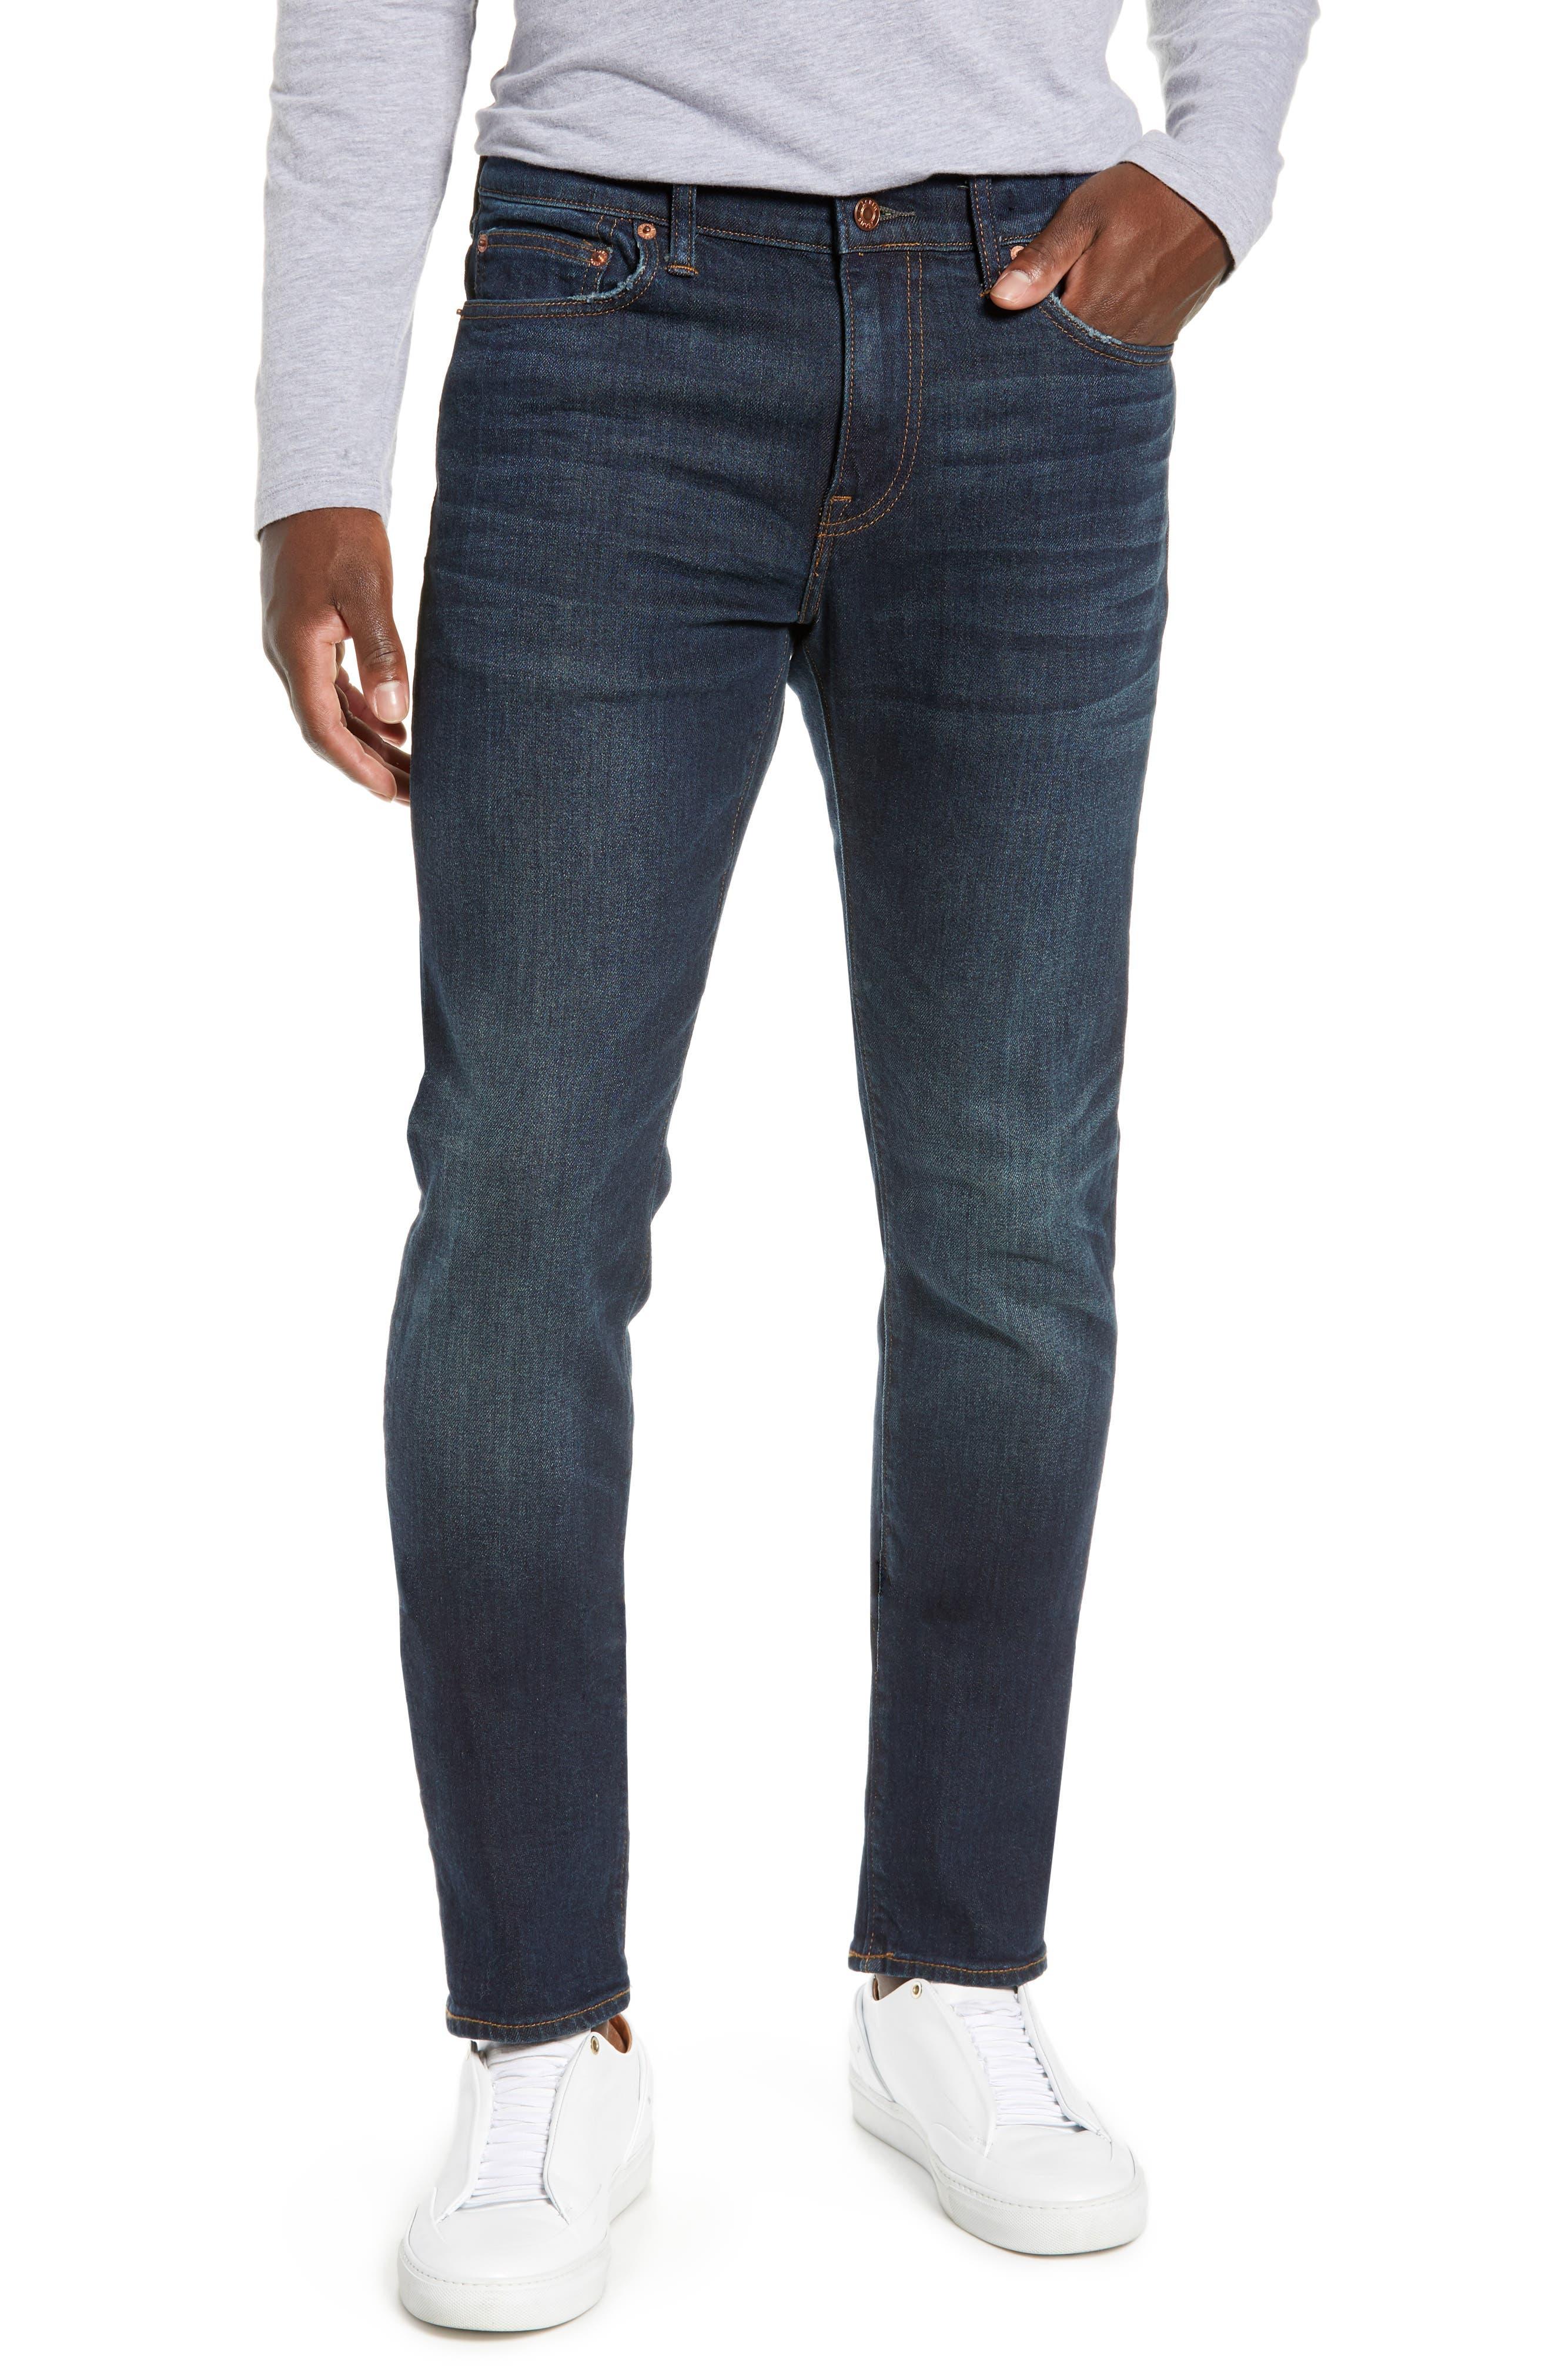 J.CREW 484 Slim Fit Stretch Jeans in Dark Worn-In Wash